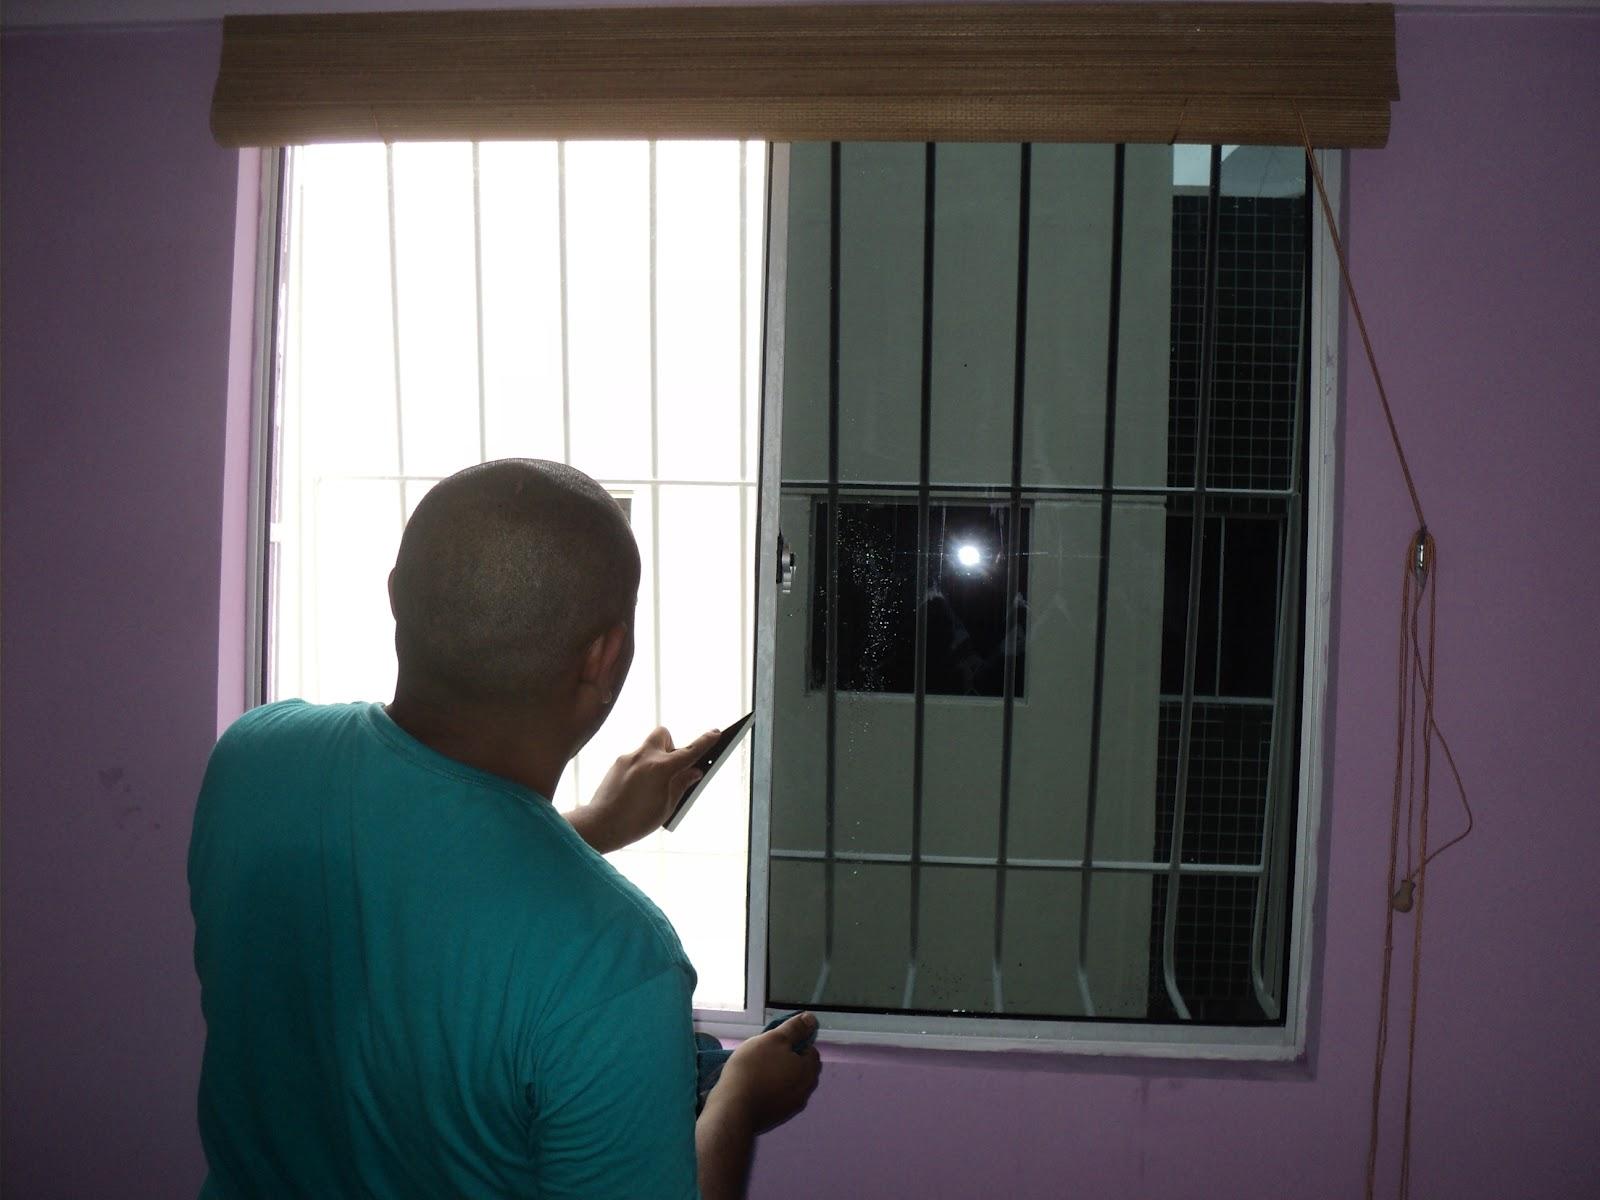 #3C5E60 Light Off Películas 81 99788 6925 tim e whatsapp: Setembro 2012 270 Janelas De Vidro Recife Pe